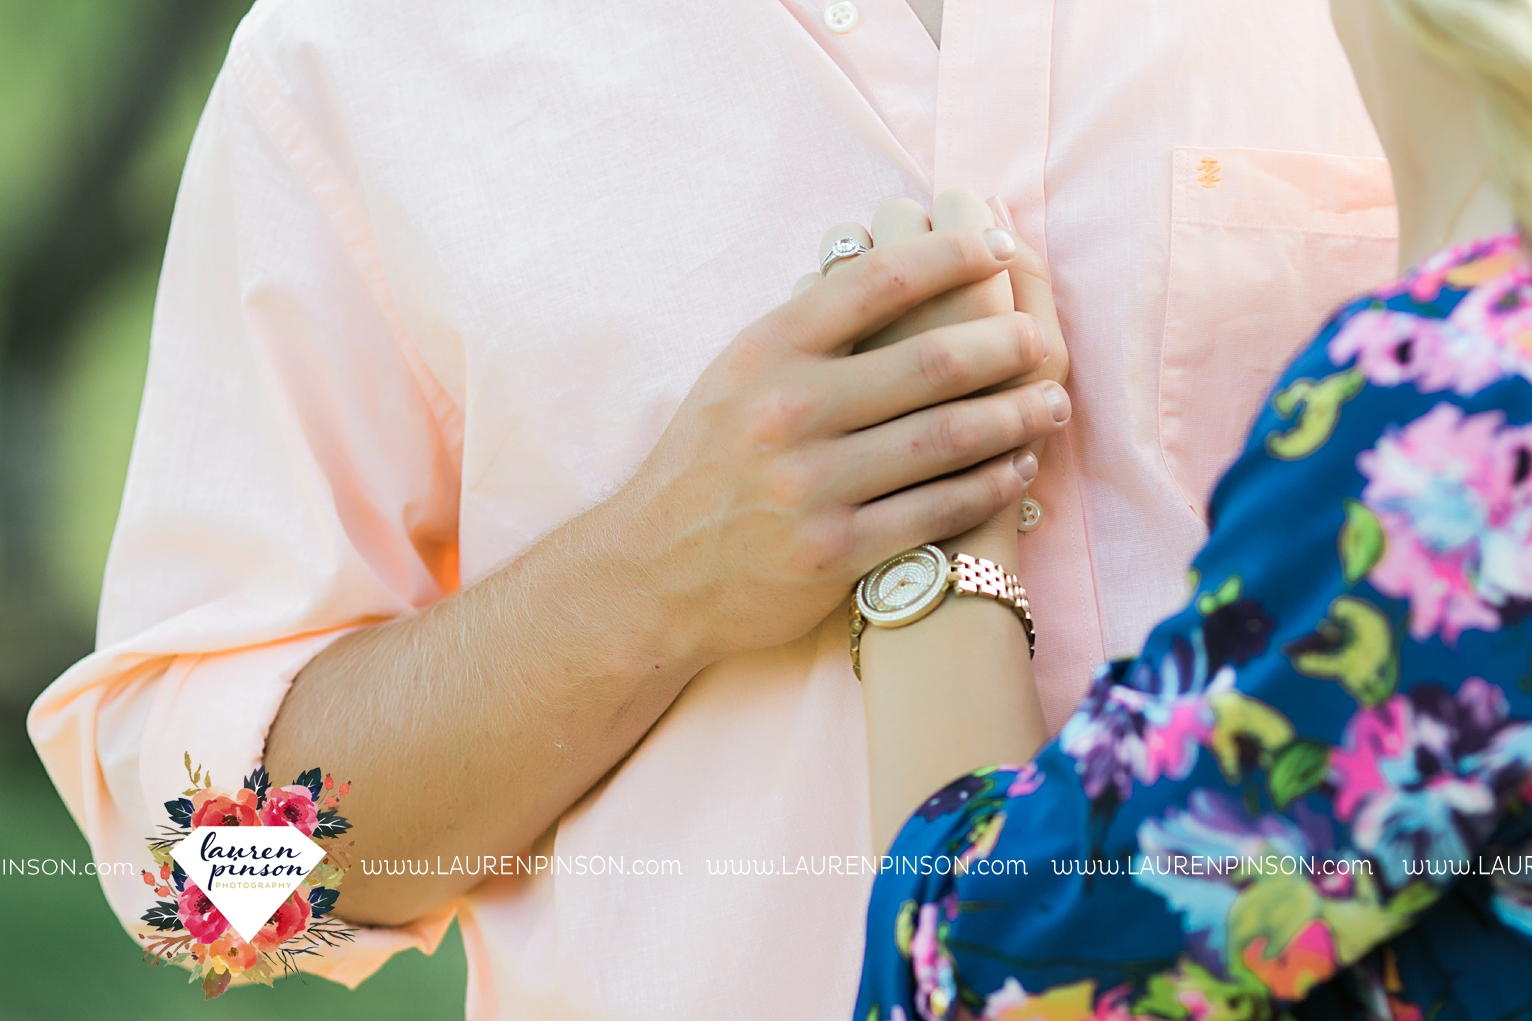 wichita-falls-texas-wedding-photographer-scotland-texas-engagement-session-country-barn-field-windthorst_2739.jpg